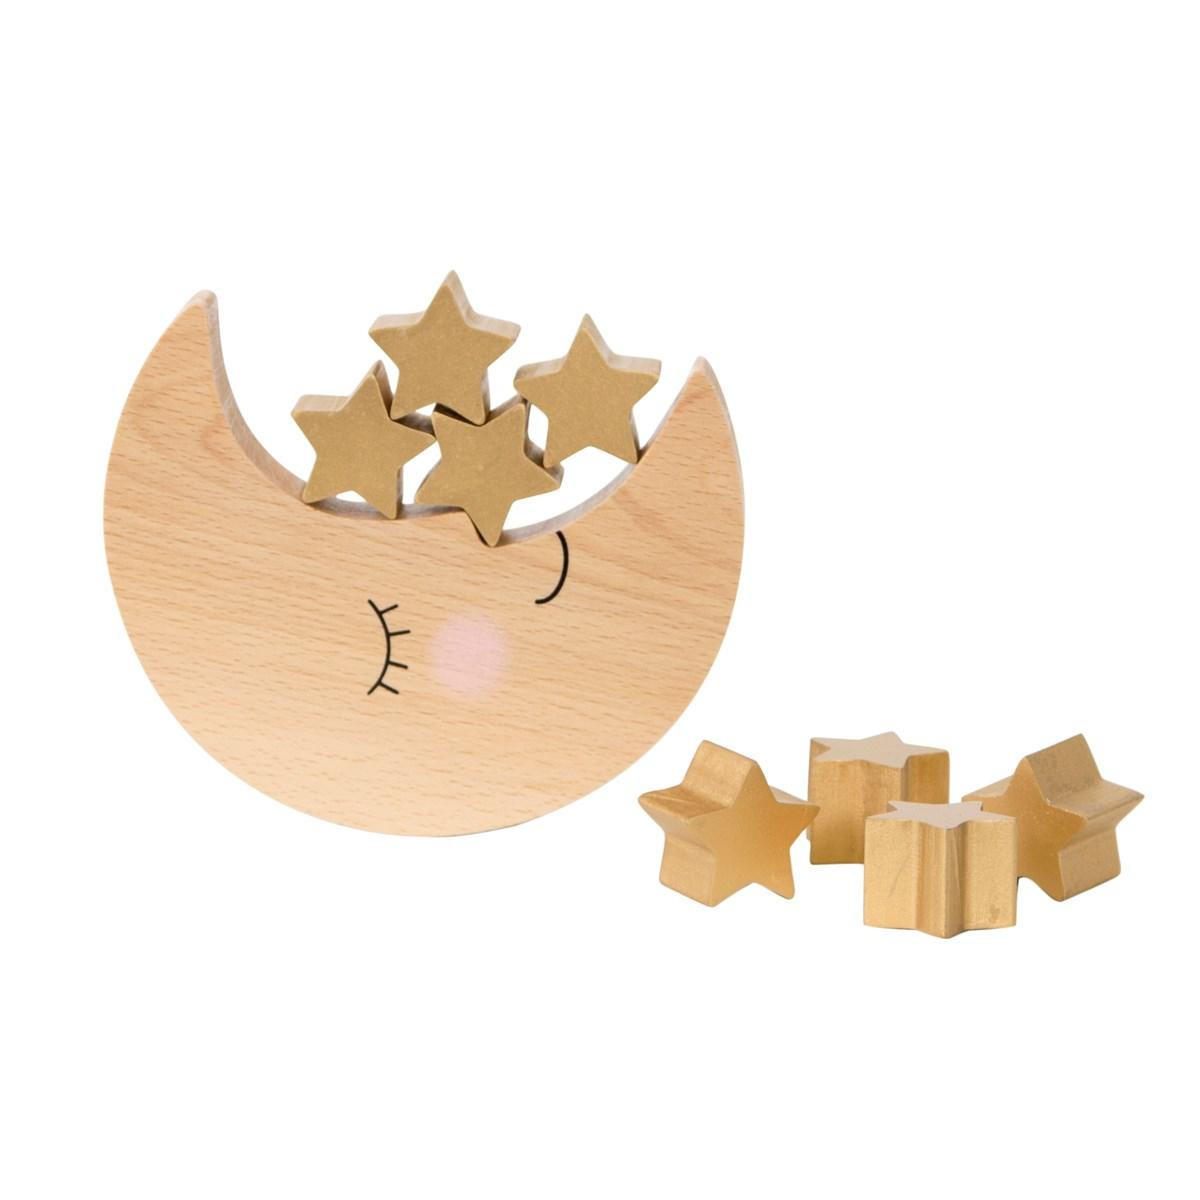 Wooden Balancing Game: Odd Bunnies